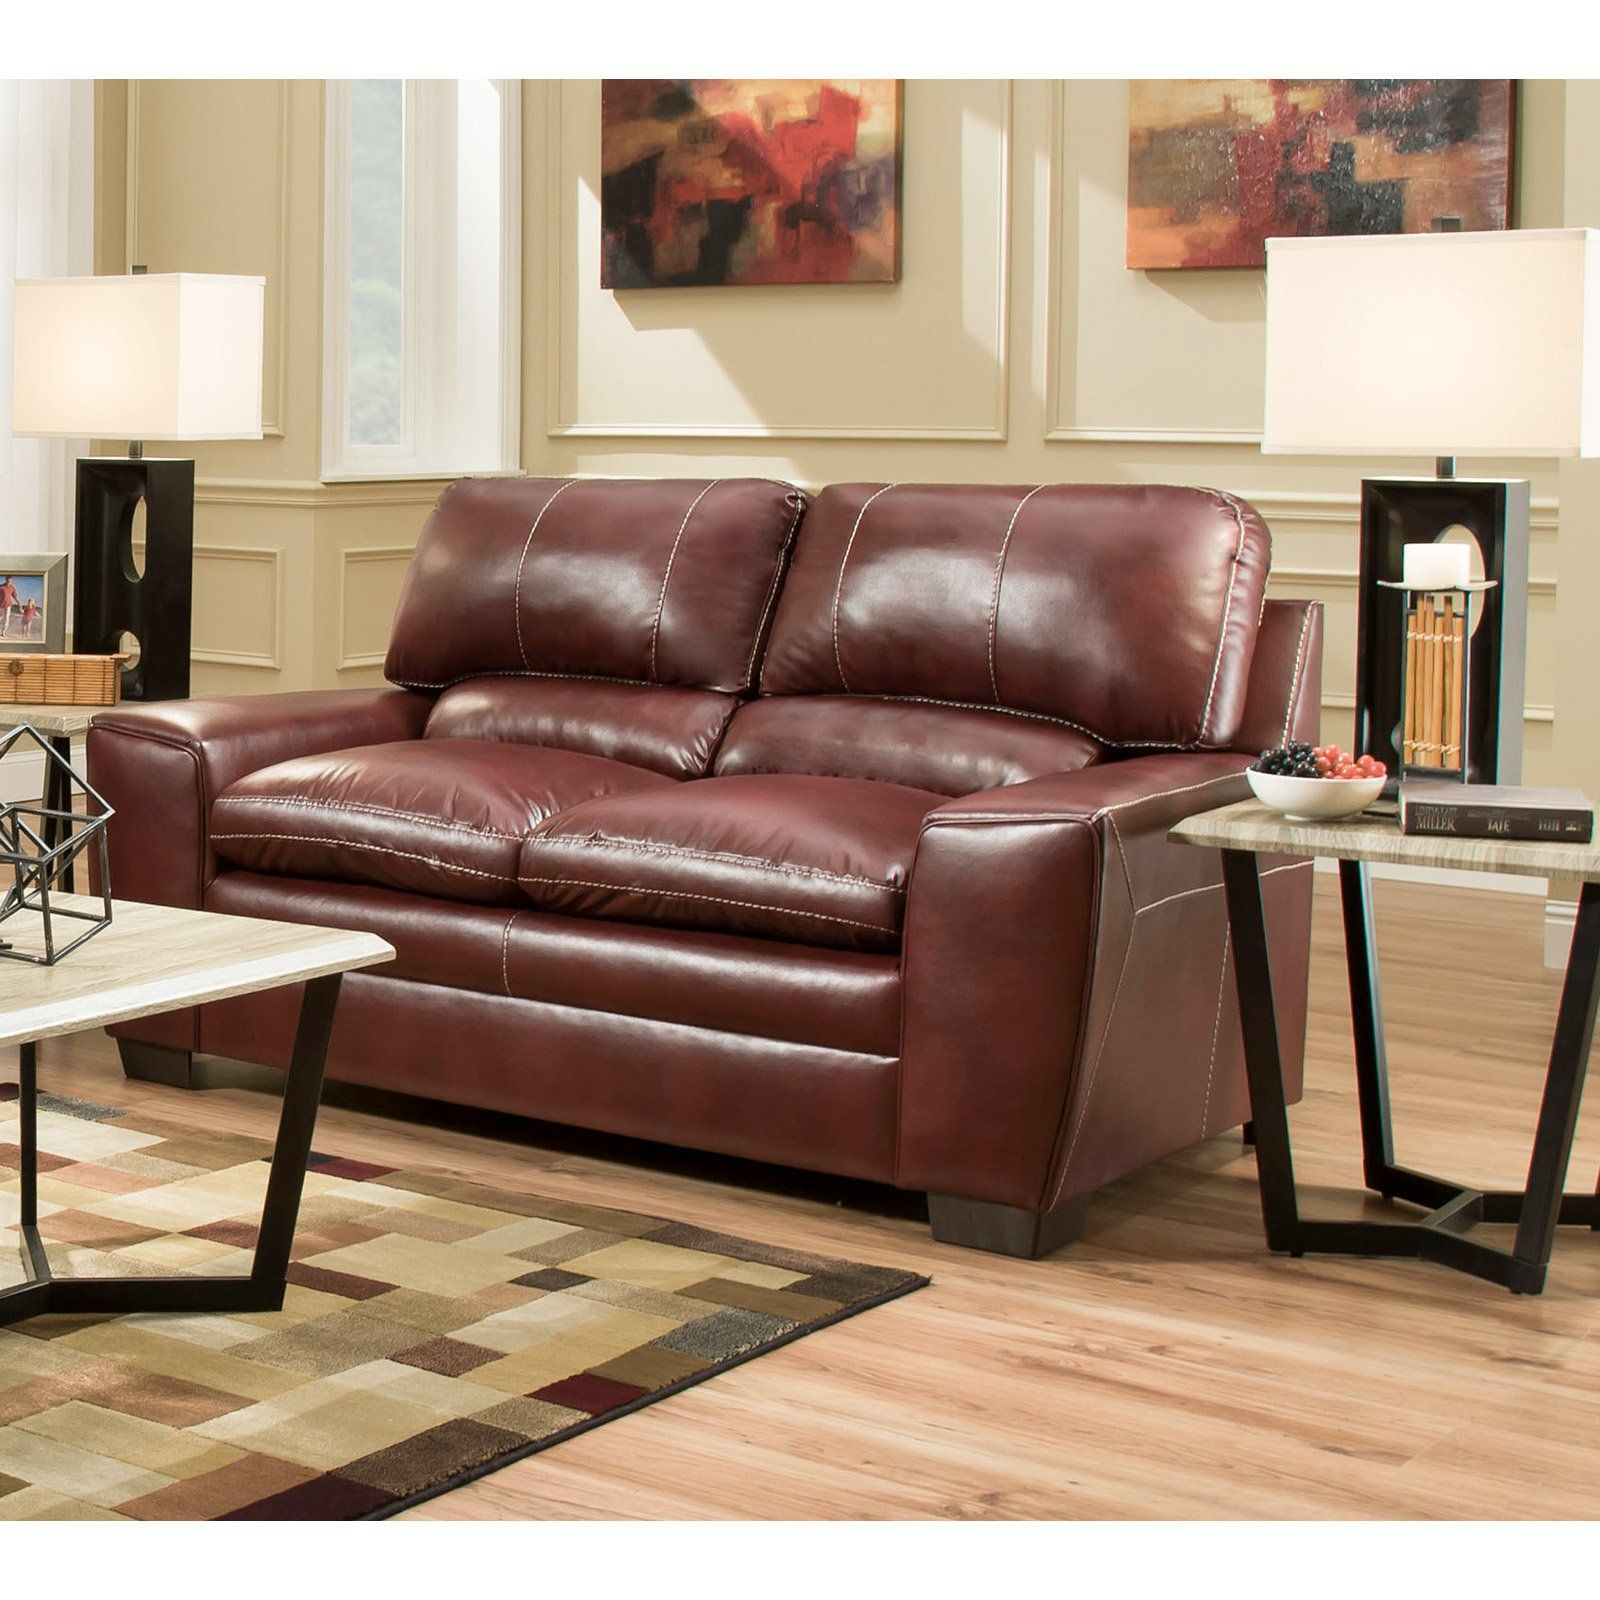 Phenomenal Simmons Upholstery Medusa Loveseat 9085 02 Medusa Cinnamon Alphanode Cool Chair Designs And Ideas Alphanodeonline